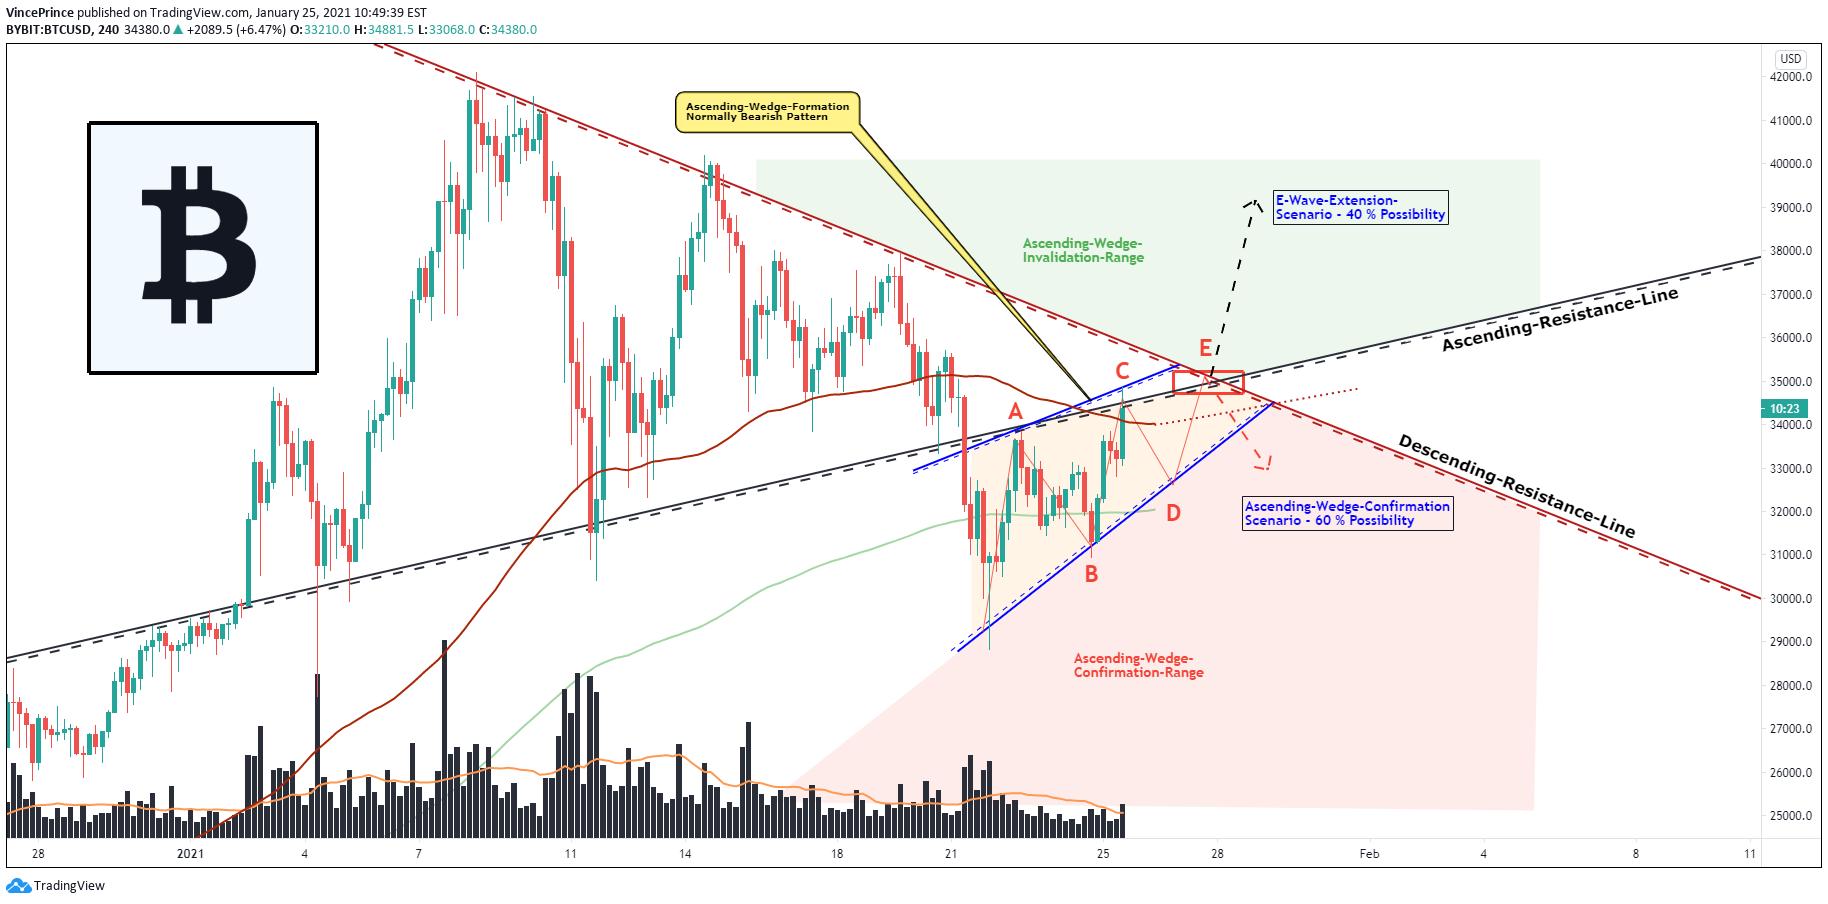 Bitcoin tradingview, Account Options